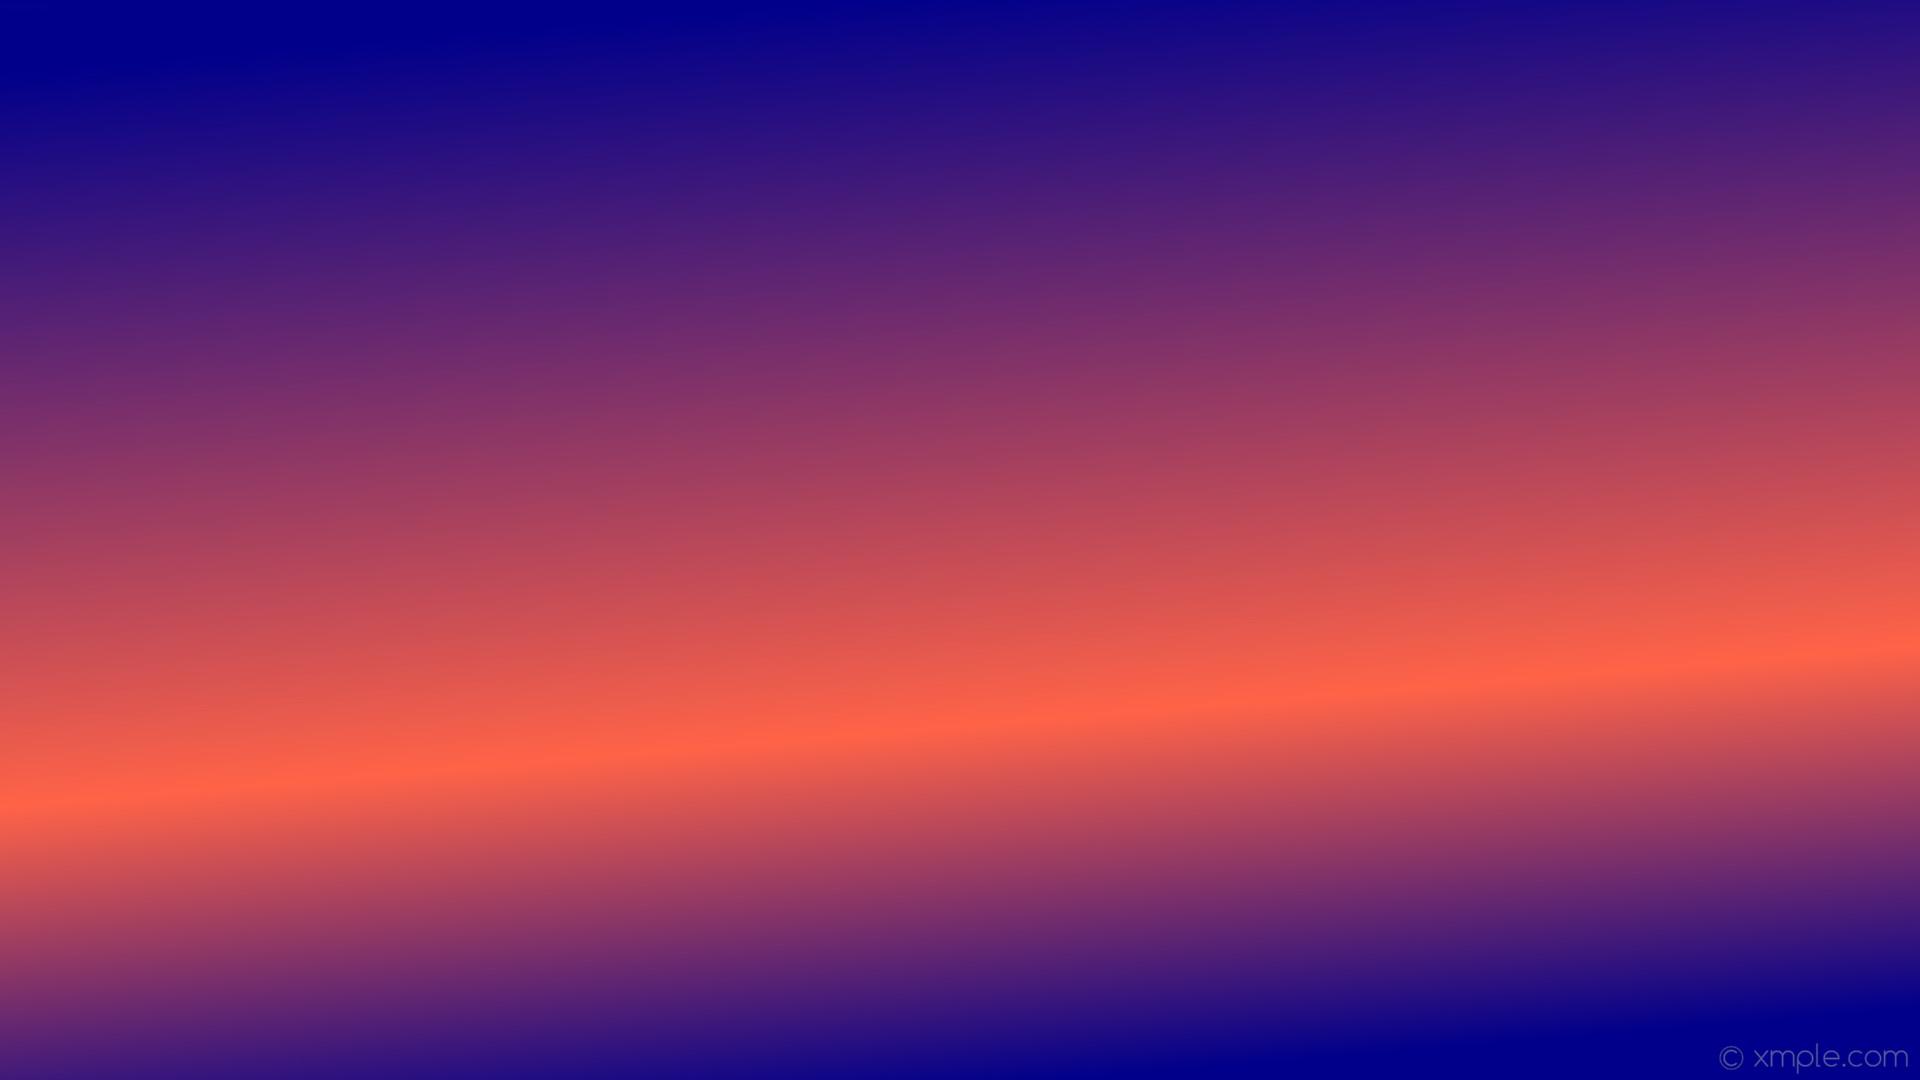 wallpaper linear orange blue gradient highlight dark blue tomato #00008b  #ff6347 285° 33